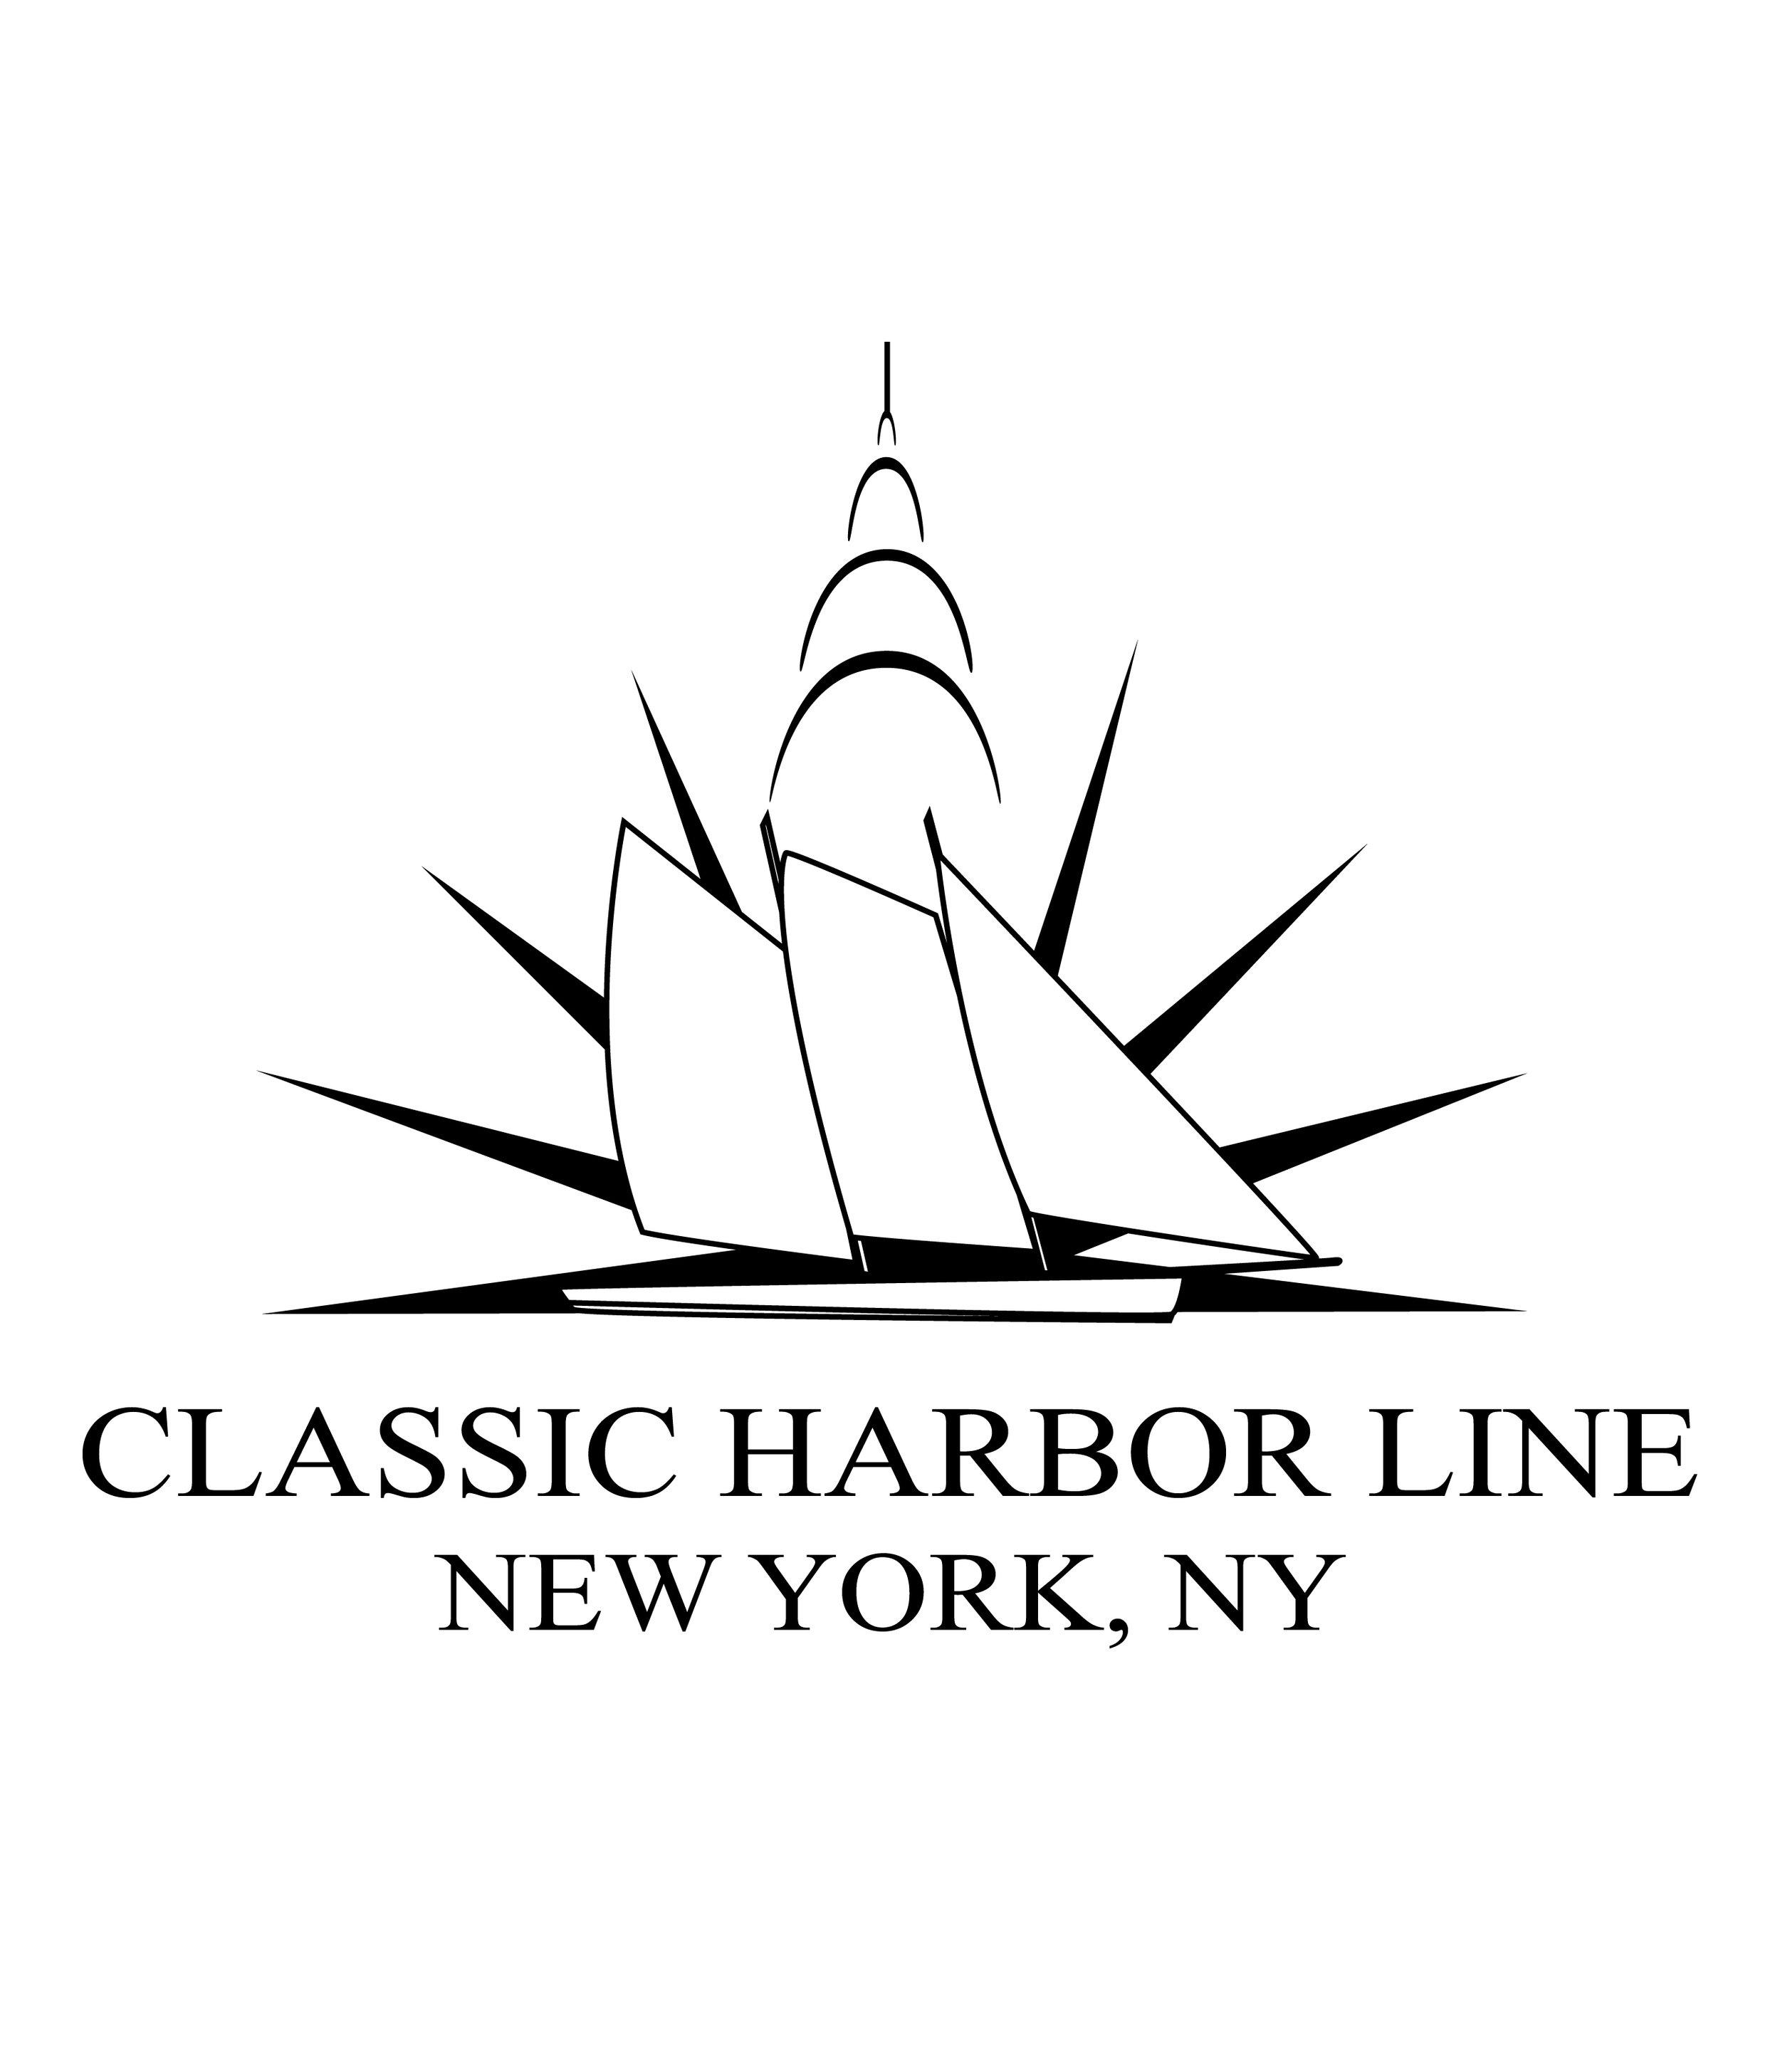 CLASSIC HARBOR LINE - NEW YORK, NEW YORK    READ MORE